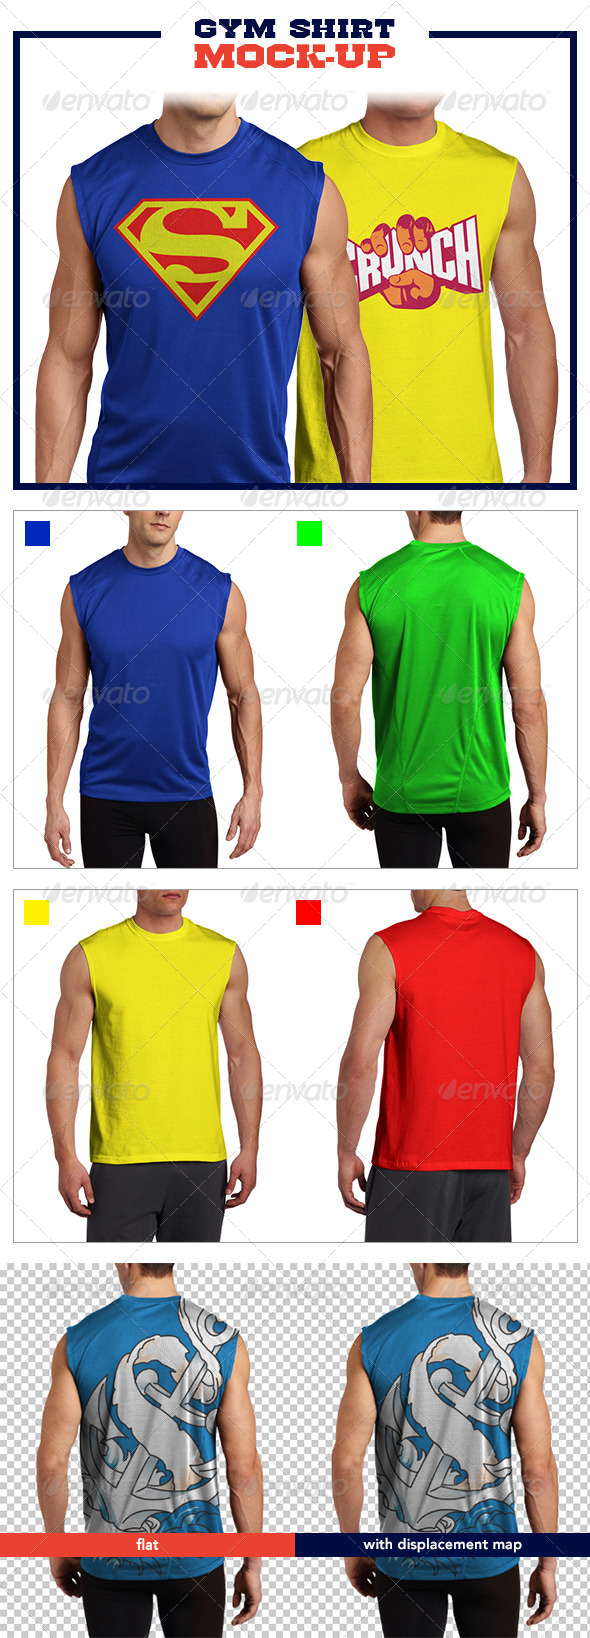 Gym Shirt Mockup Pack